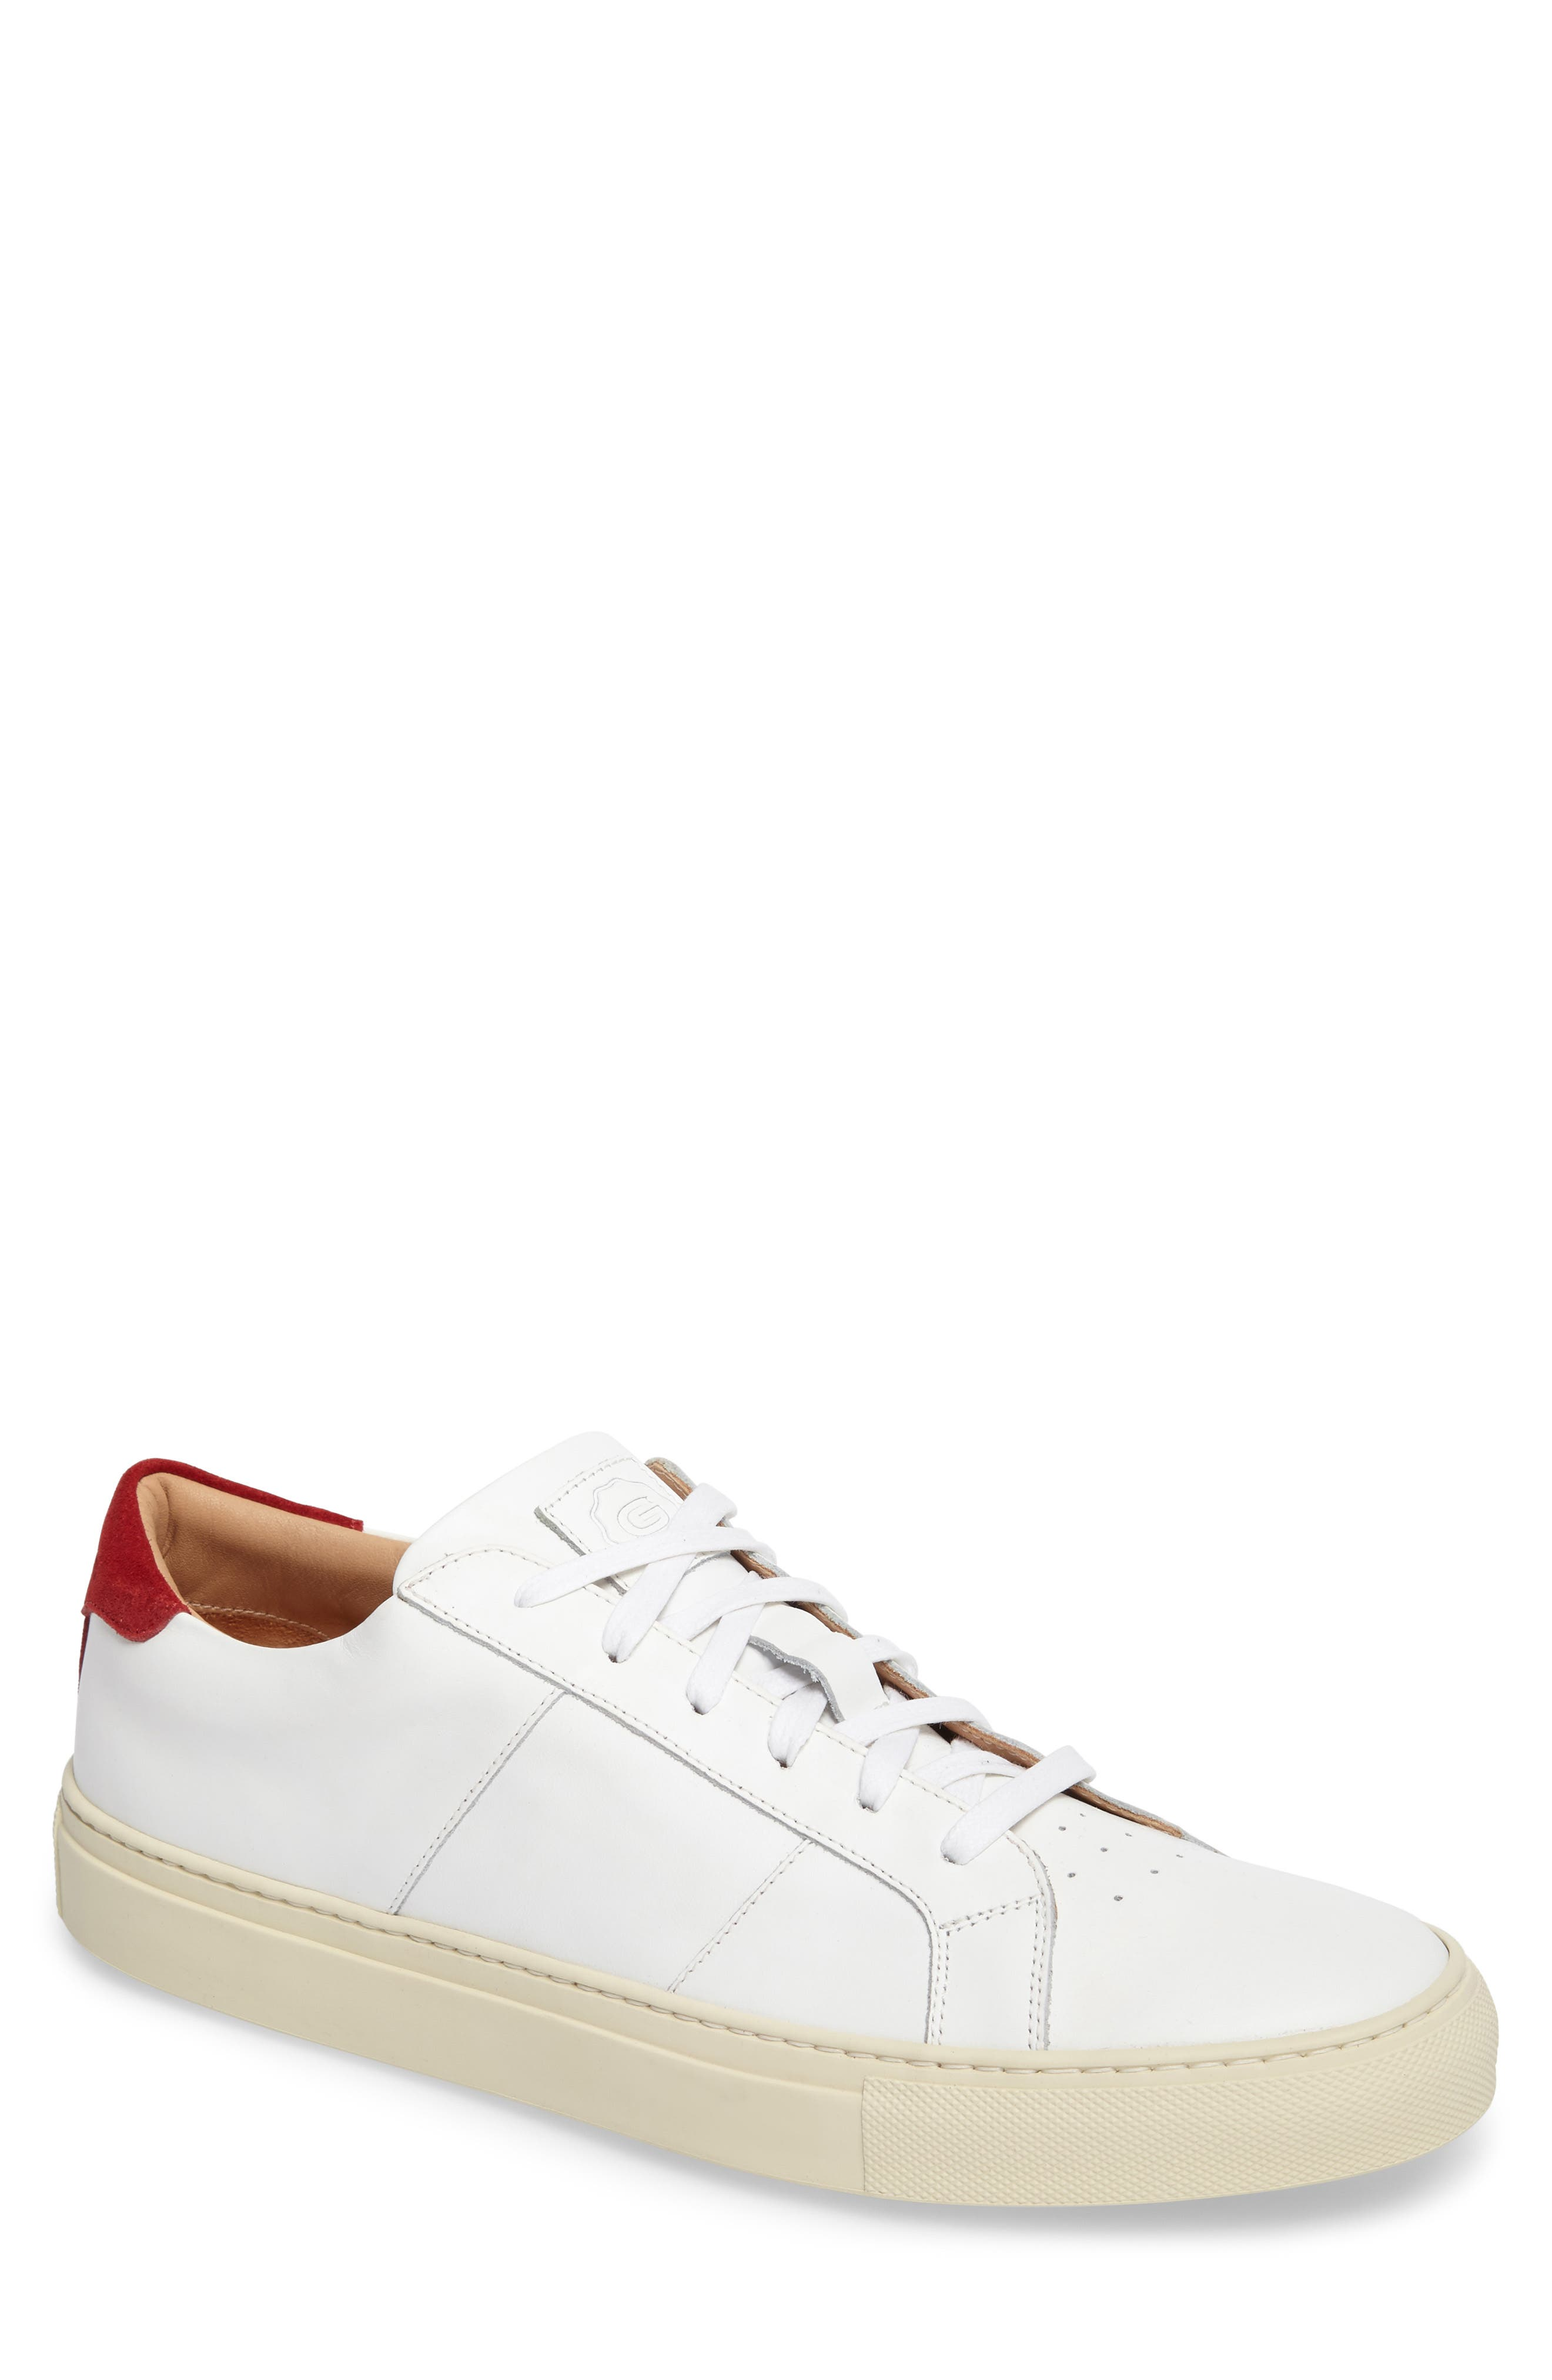 Greats Royale Vintage Low Top Sneaker- White